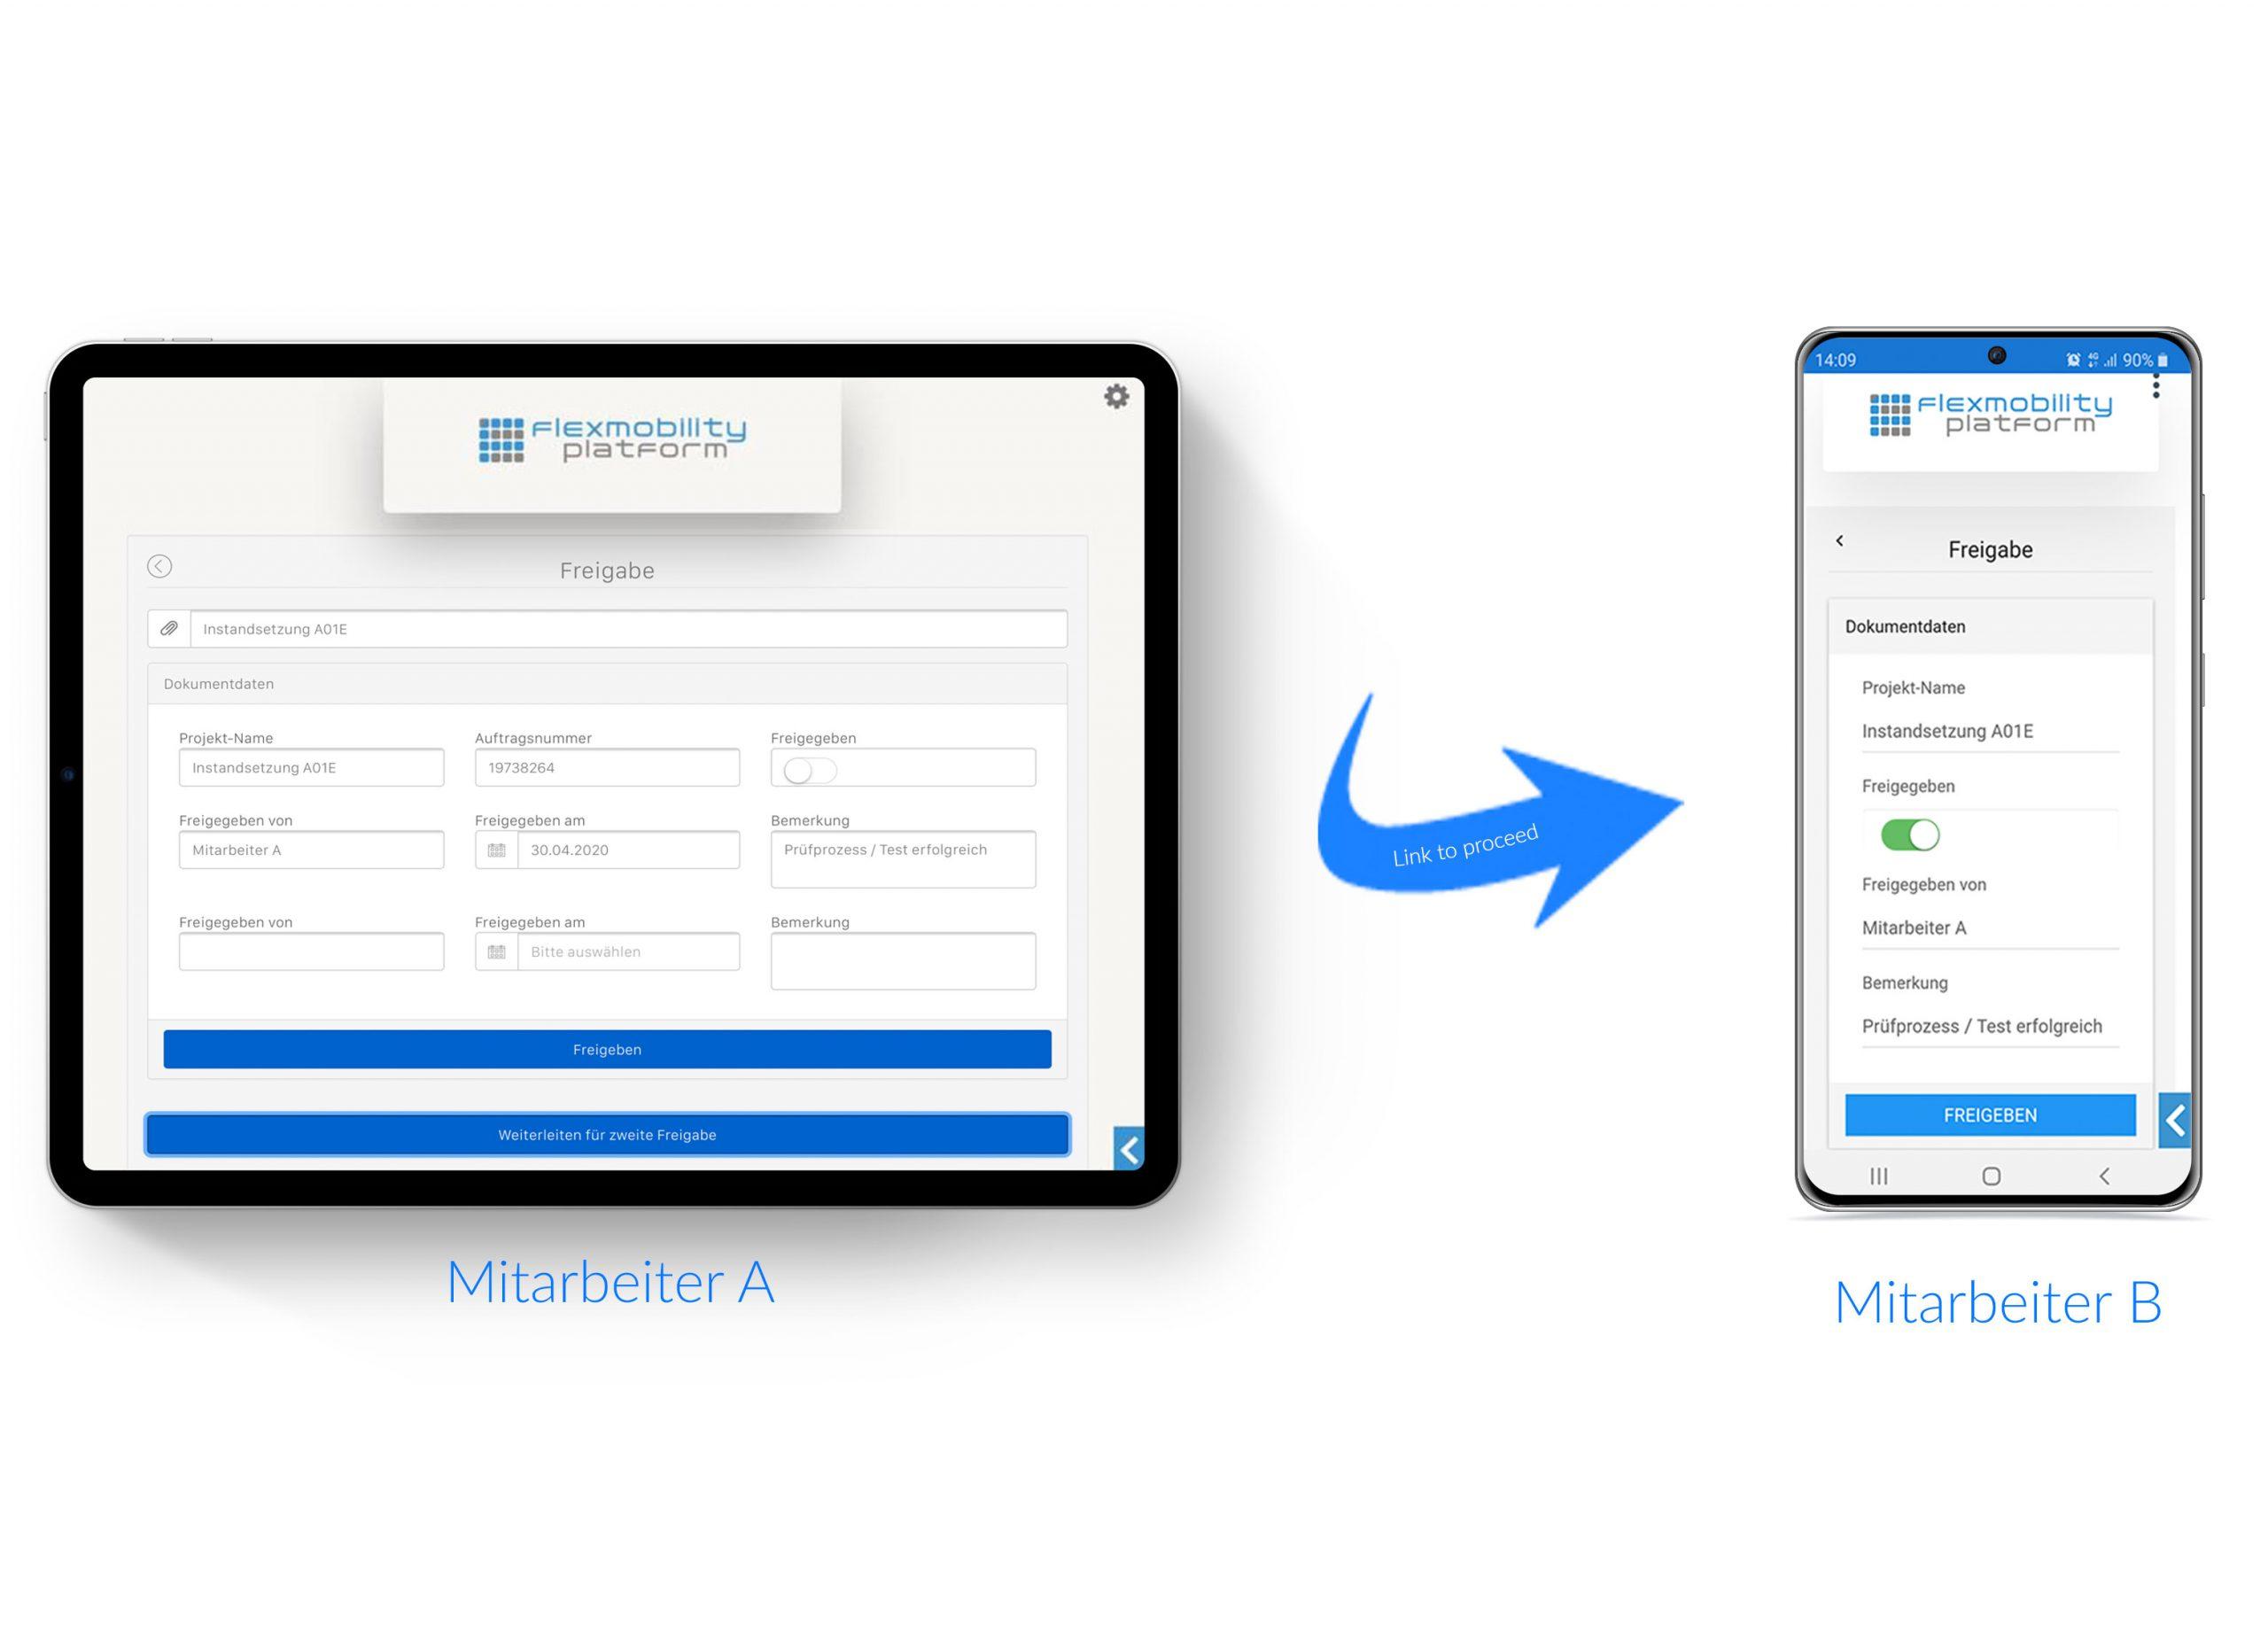 Business Apps Konfiguration flexmobility platform